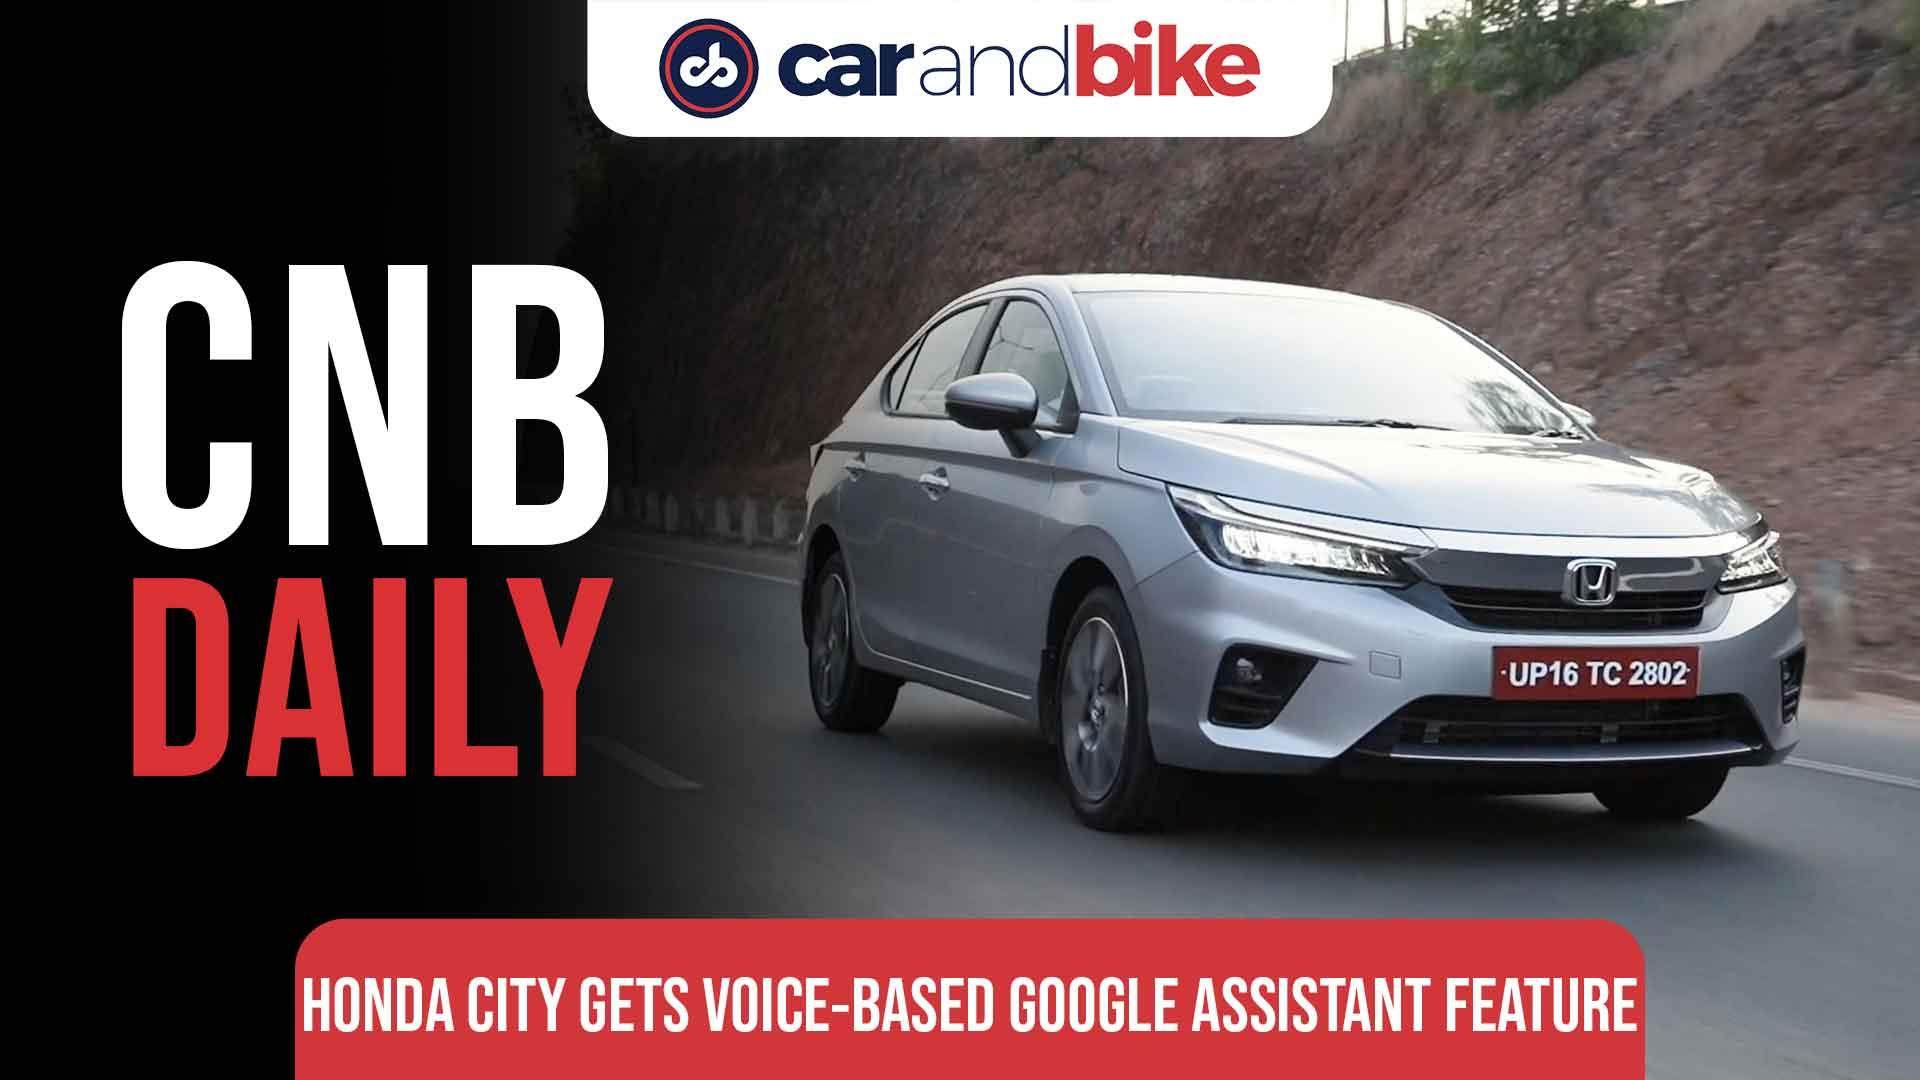 Honda City gets voice-based google assistant feature